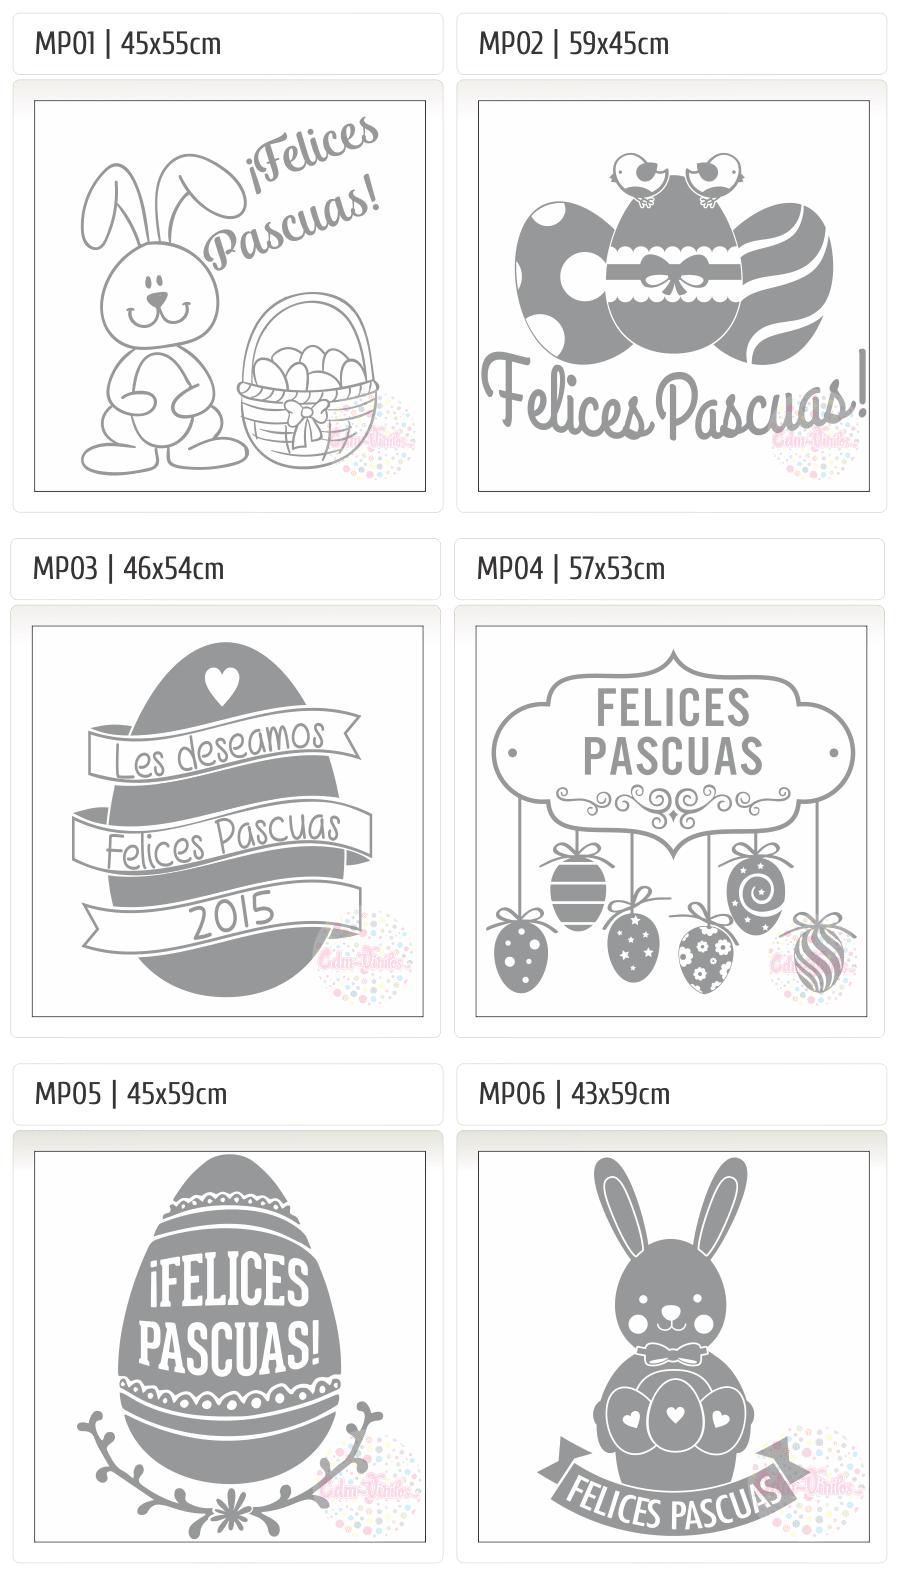 cdm-vinilos Carteles, Pascuas 2014, Vidrieras, vinilos decorativos